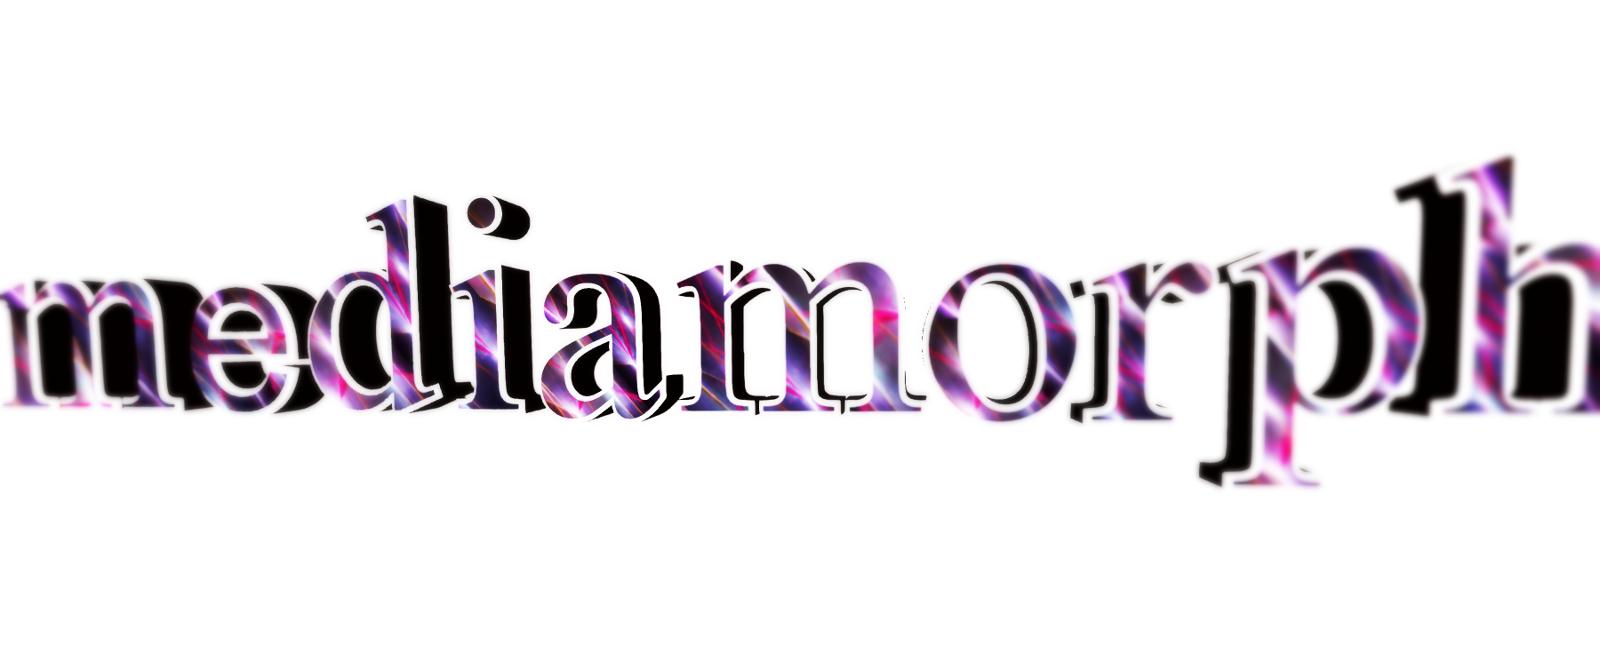 Mediamorphosis' logo